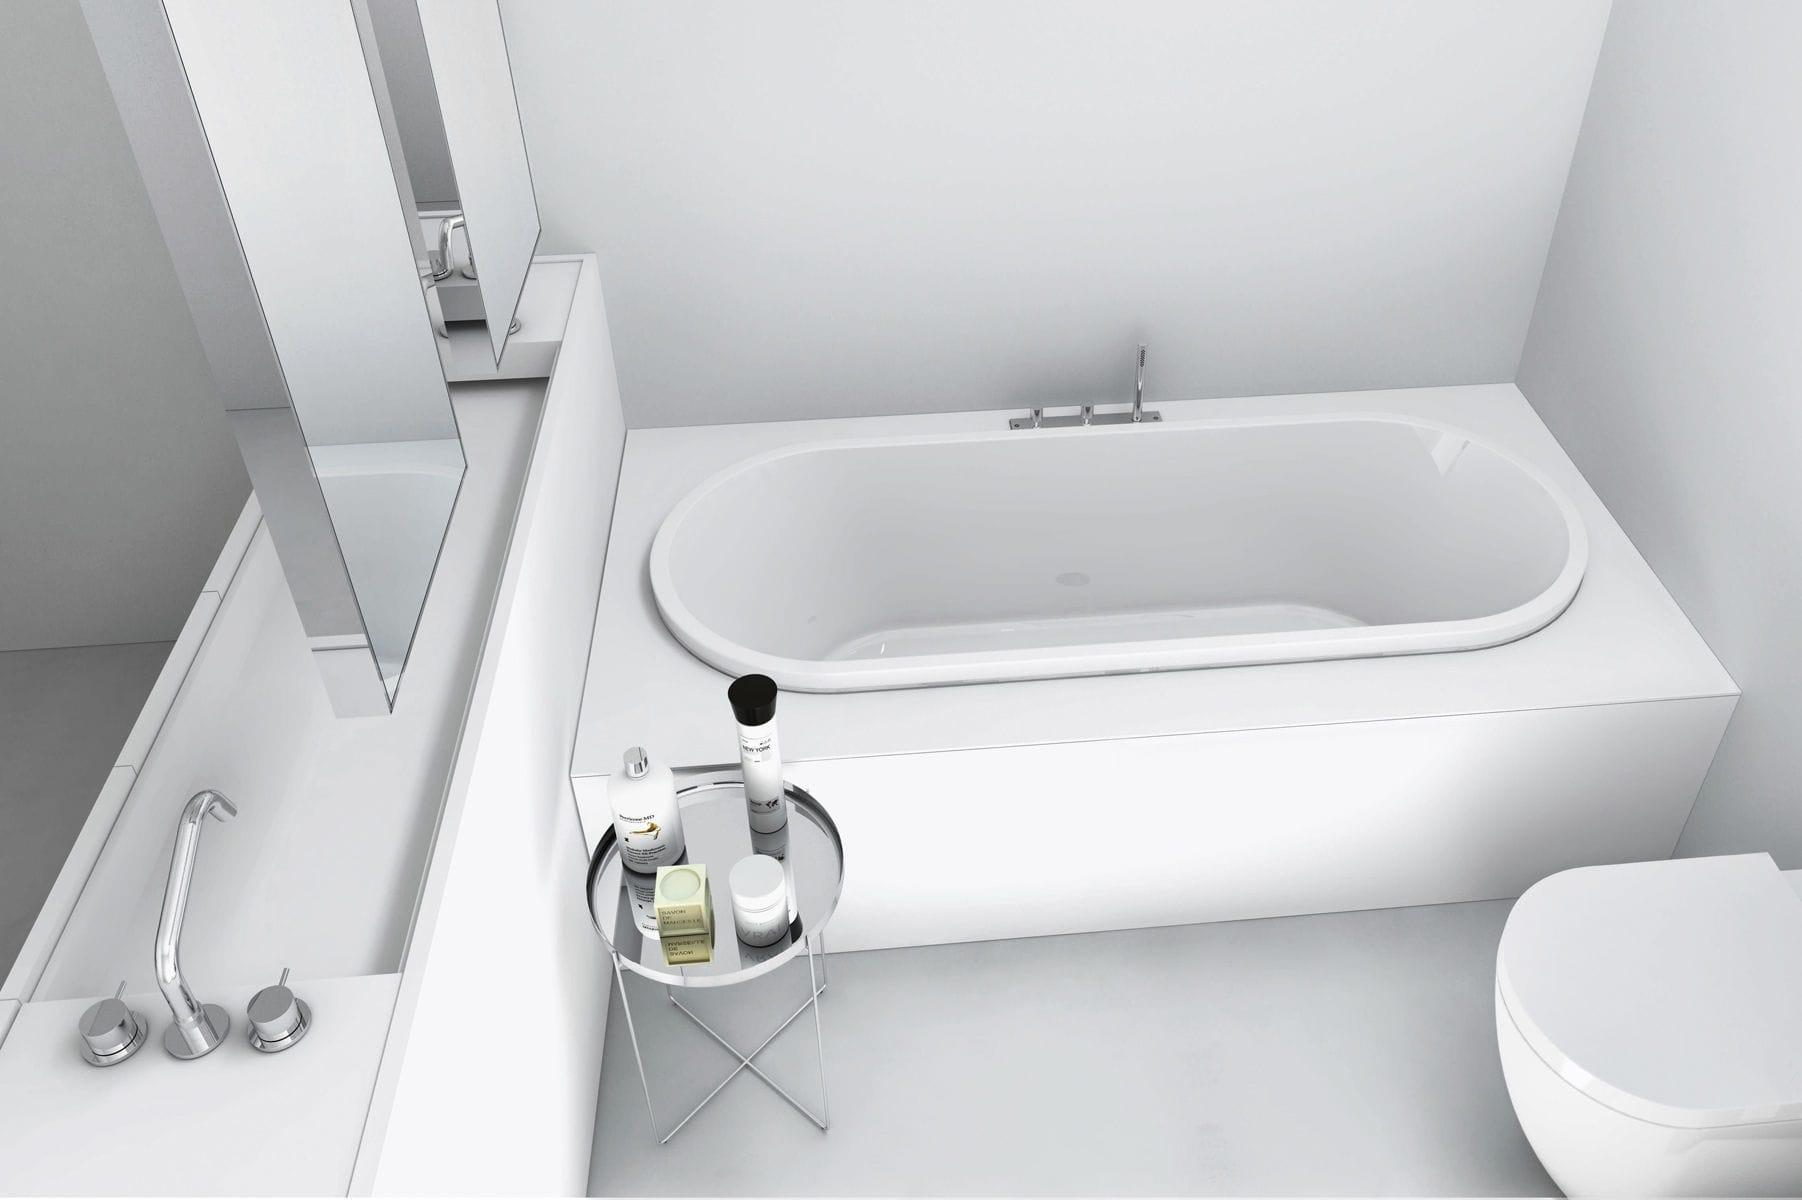 Vasca Da Bagno Incasso 190x90 : Vasche da bagno moderne innovazione e qualità porcelanosa